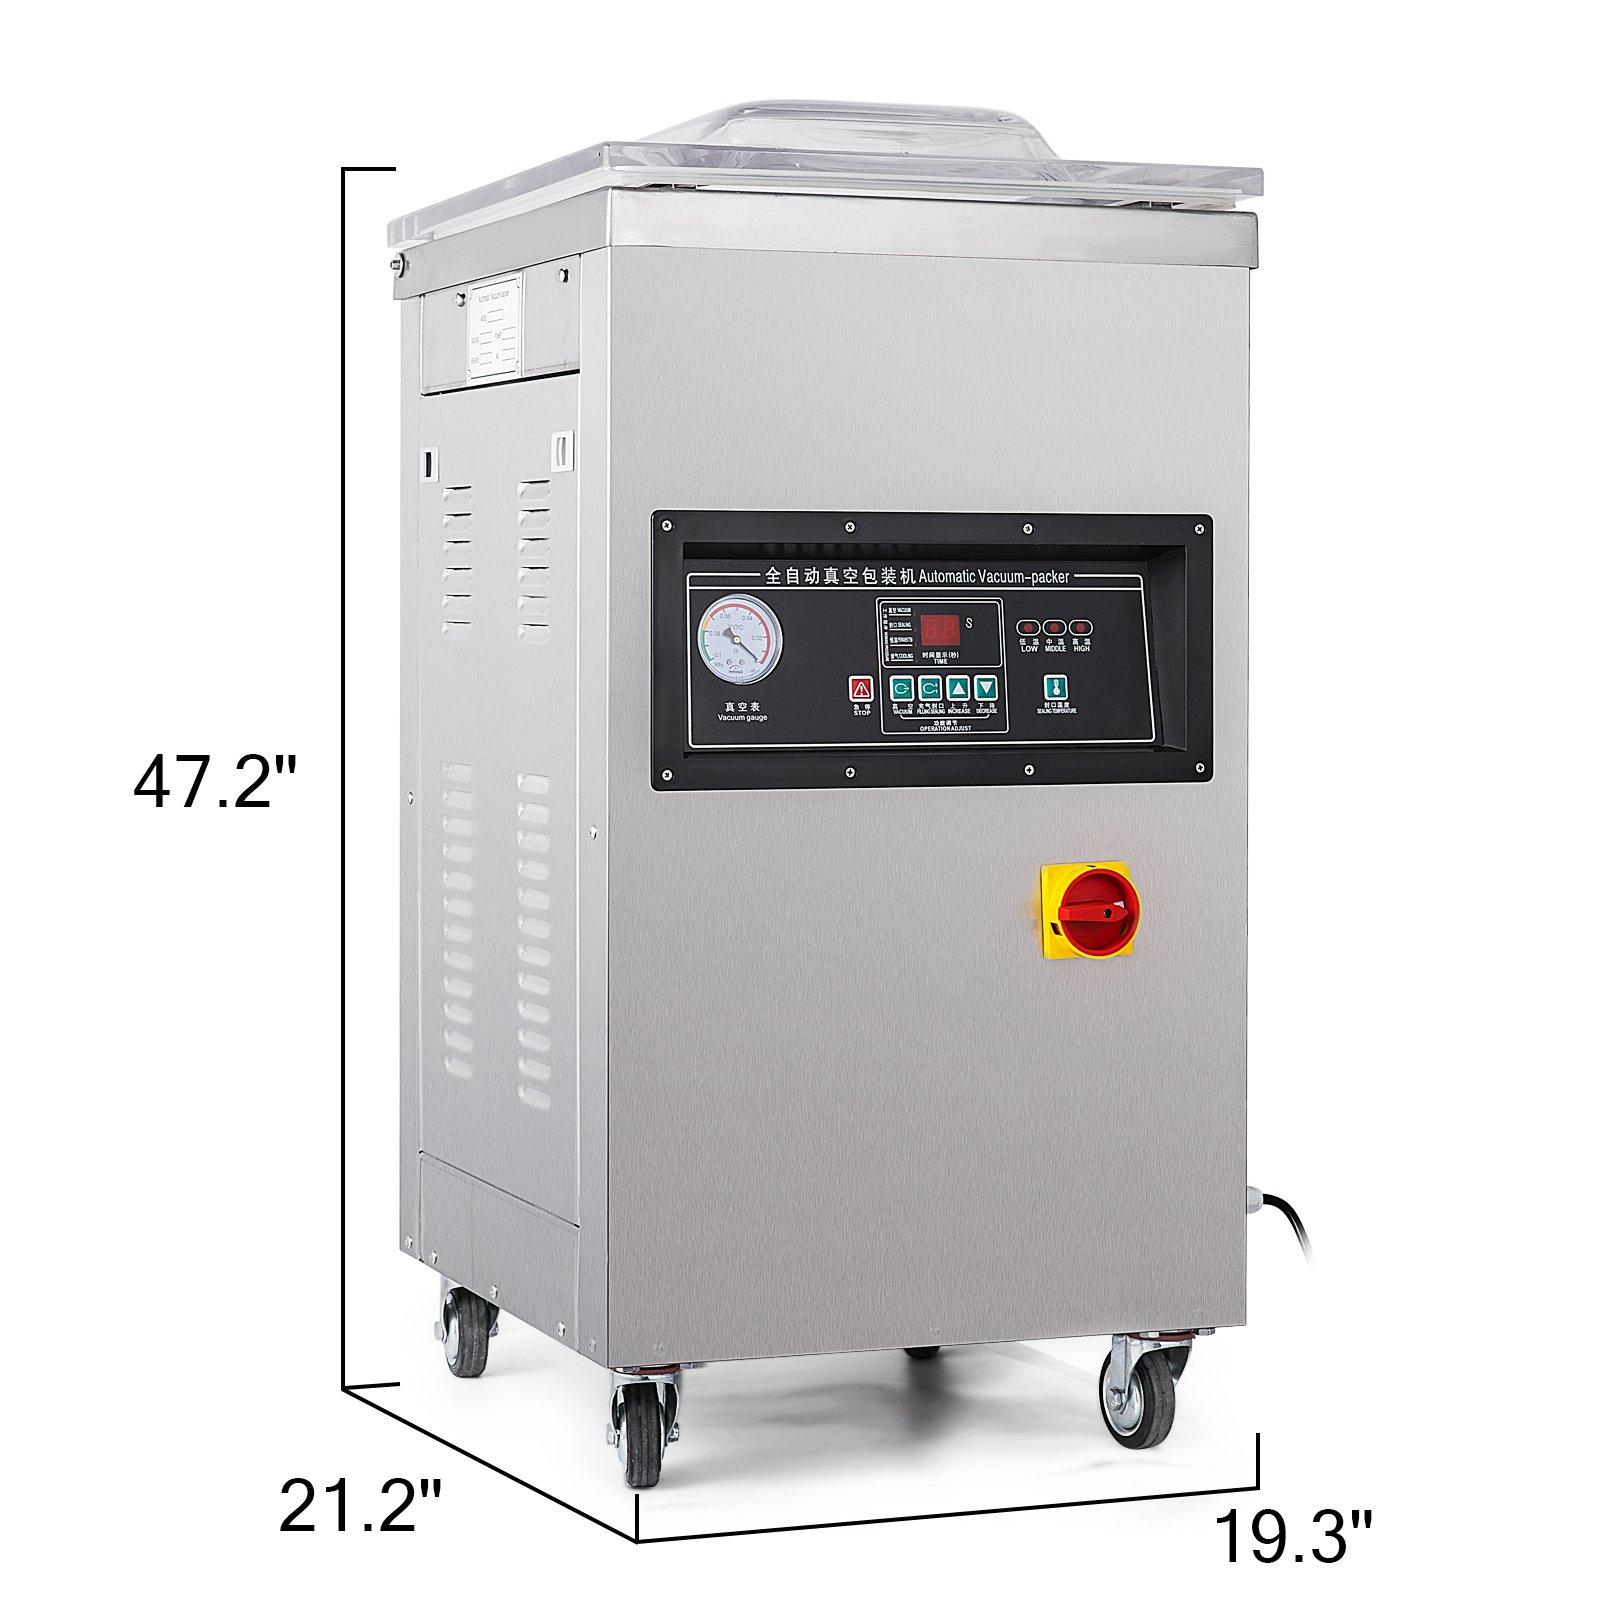 Happybuy DZ-400/2E Chamber Vacuum Sealer 1000W Vacuum Sealer Machine Automatic Vacuum Packing Sealing Sealer Machine for Home or Commercial Use (DZ-400/2E) by Happybuy (Image #2)